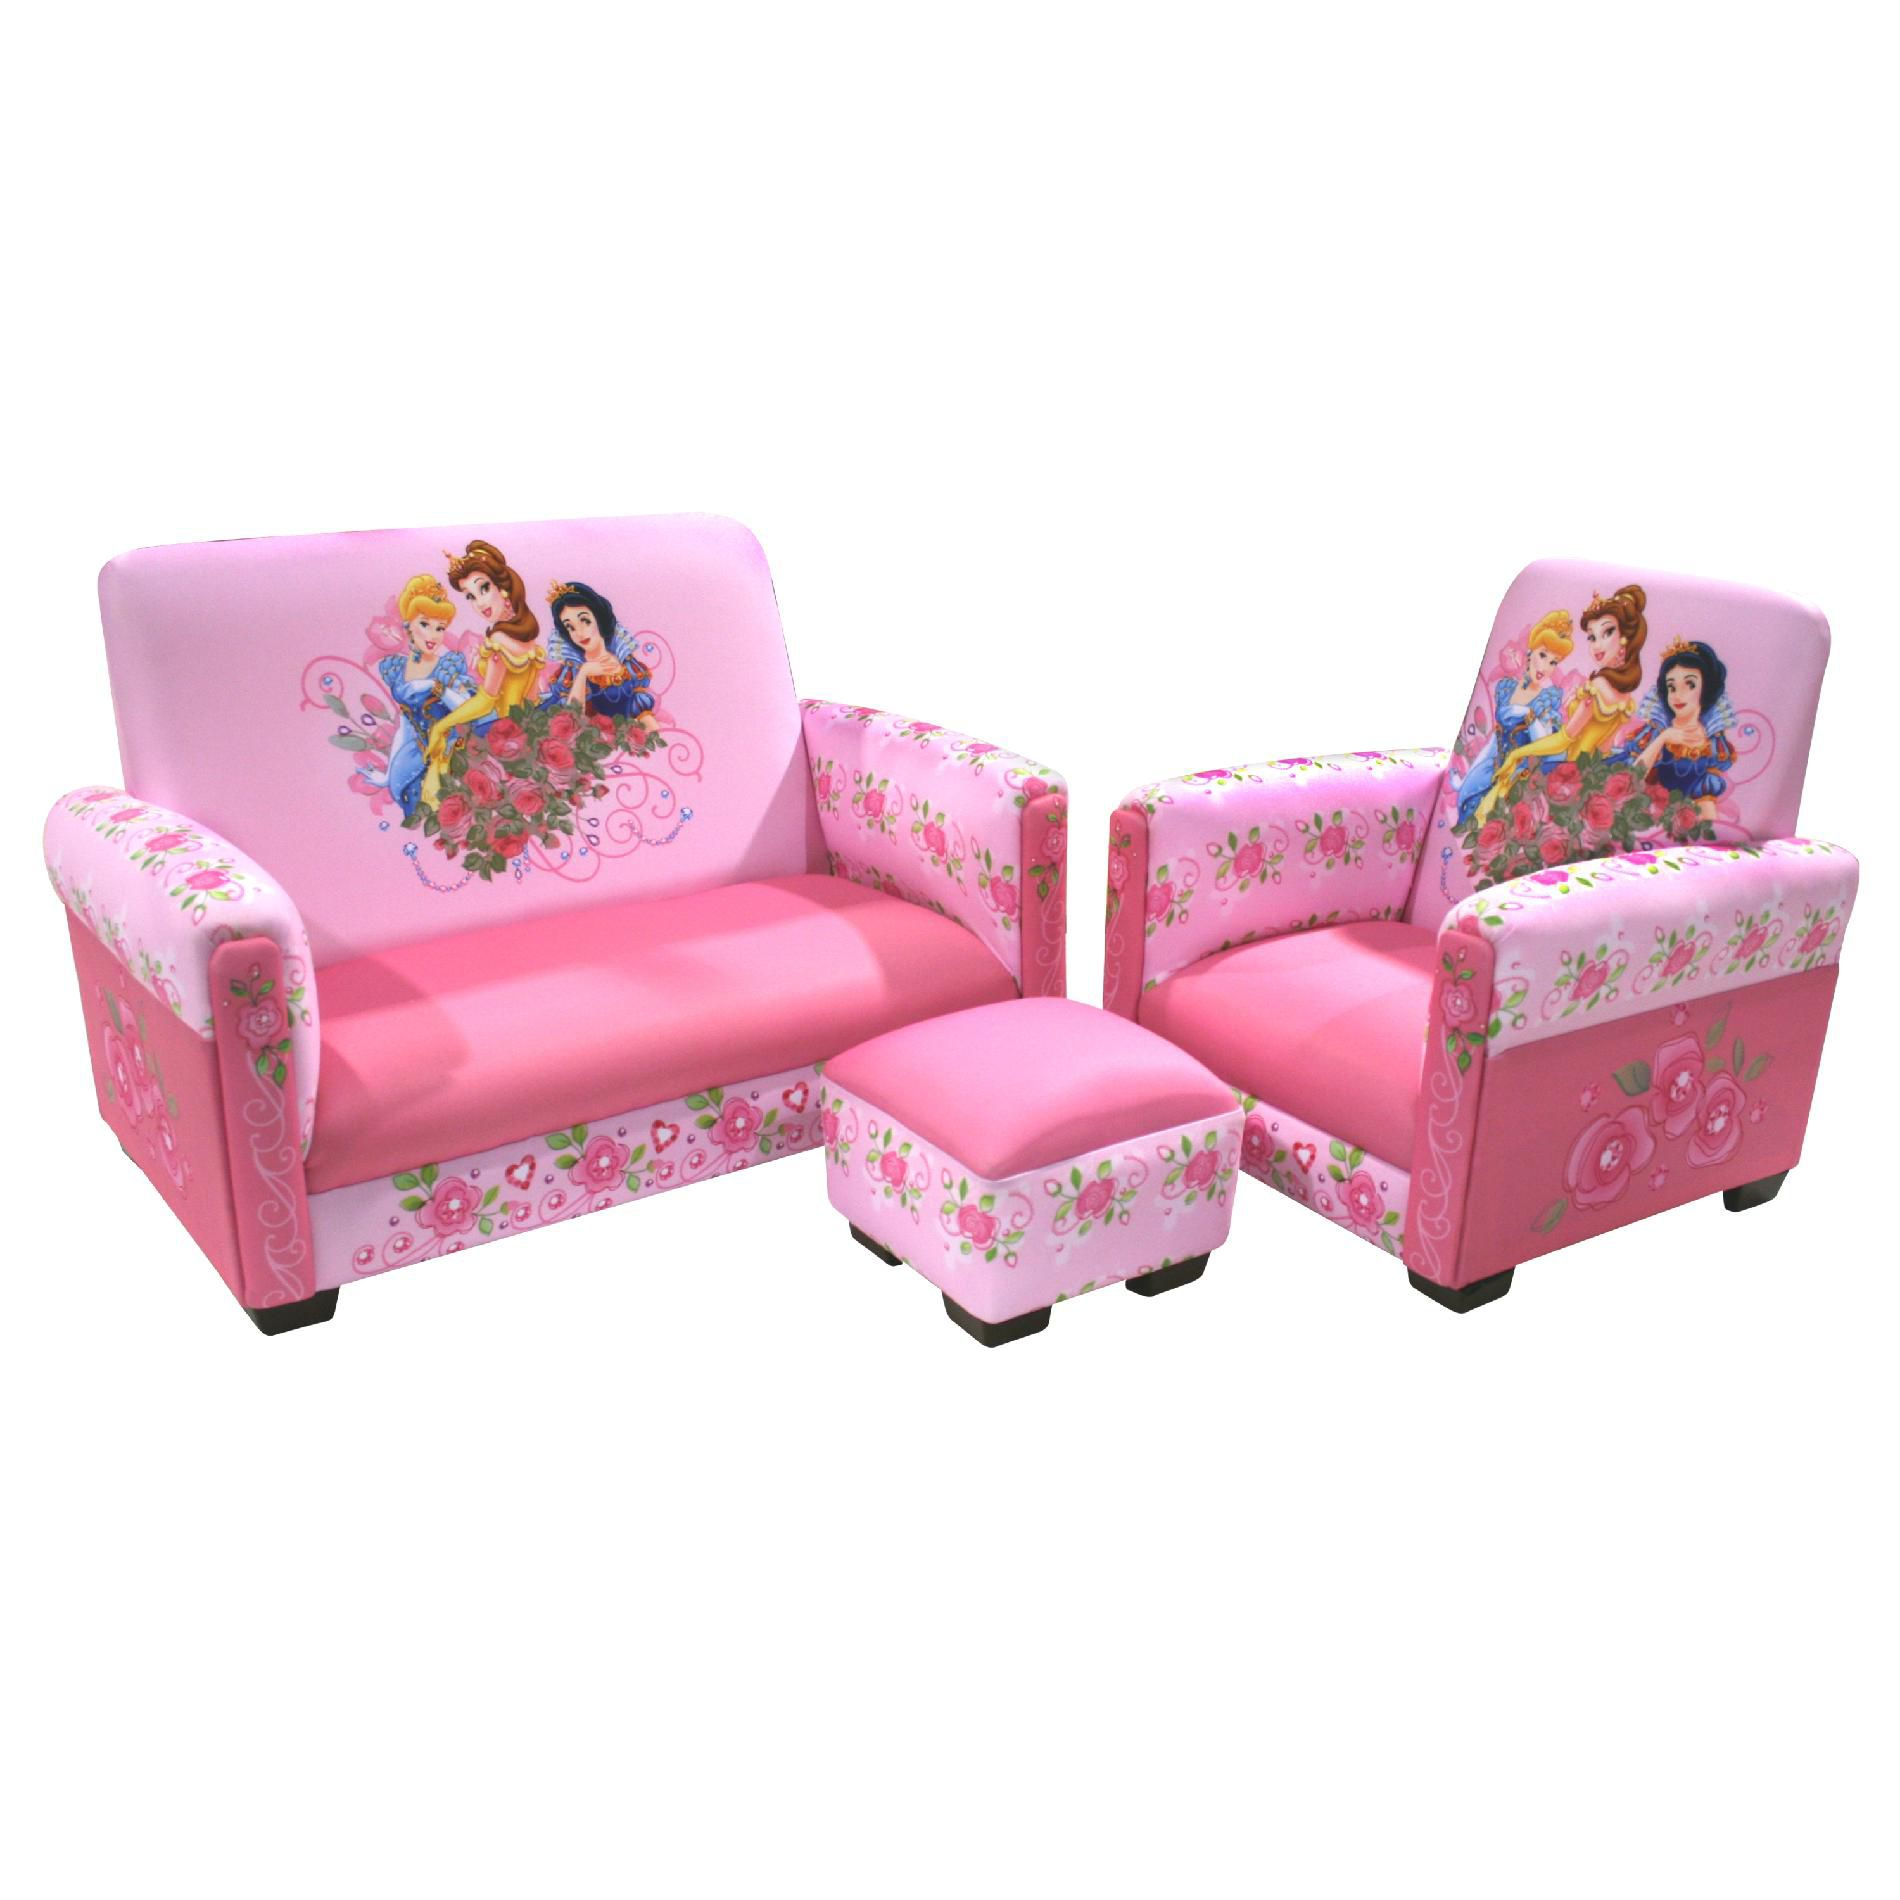 Delta Children Disney Princess Jeweled Gardens Toddler Sofa Chair and Ottoman Set